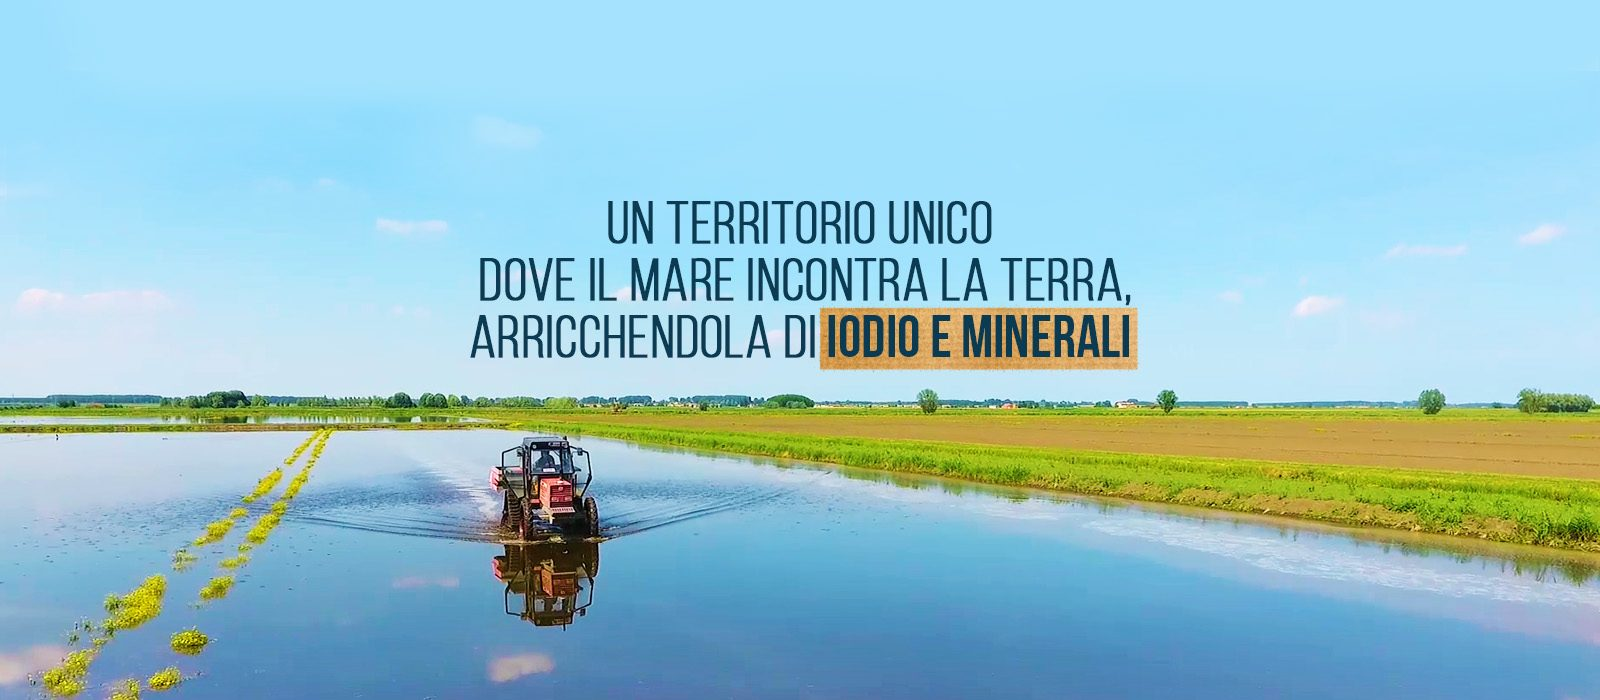 3_GrandiRiso_Slide_1600x700_acqua terra_GdP_0